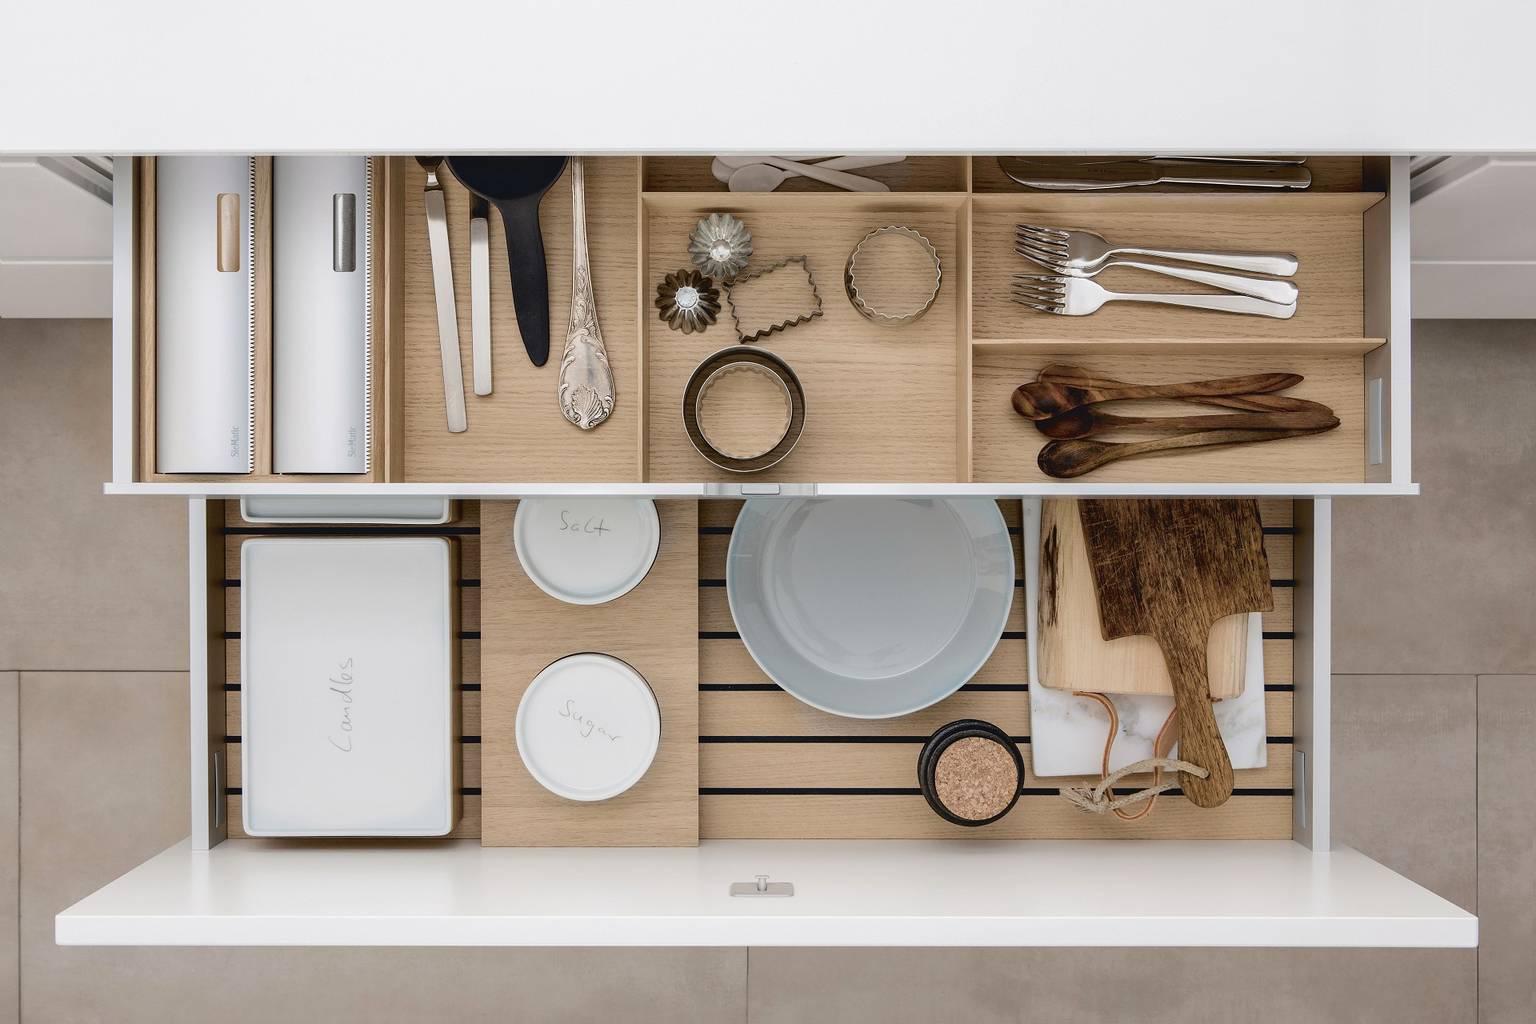 ... versatile combination of siematic kitchen accessories in light oak wood XBVGLUS